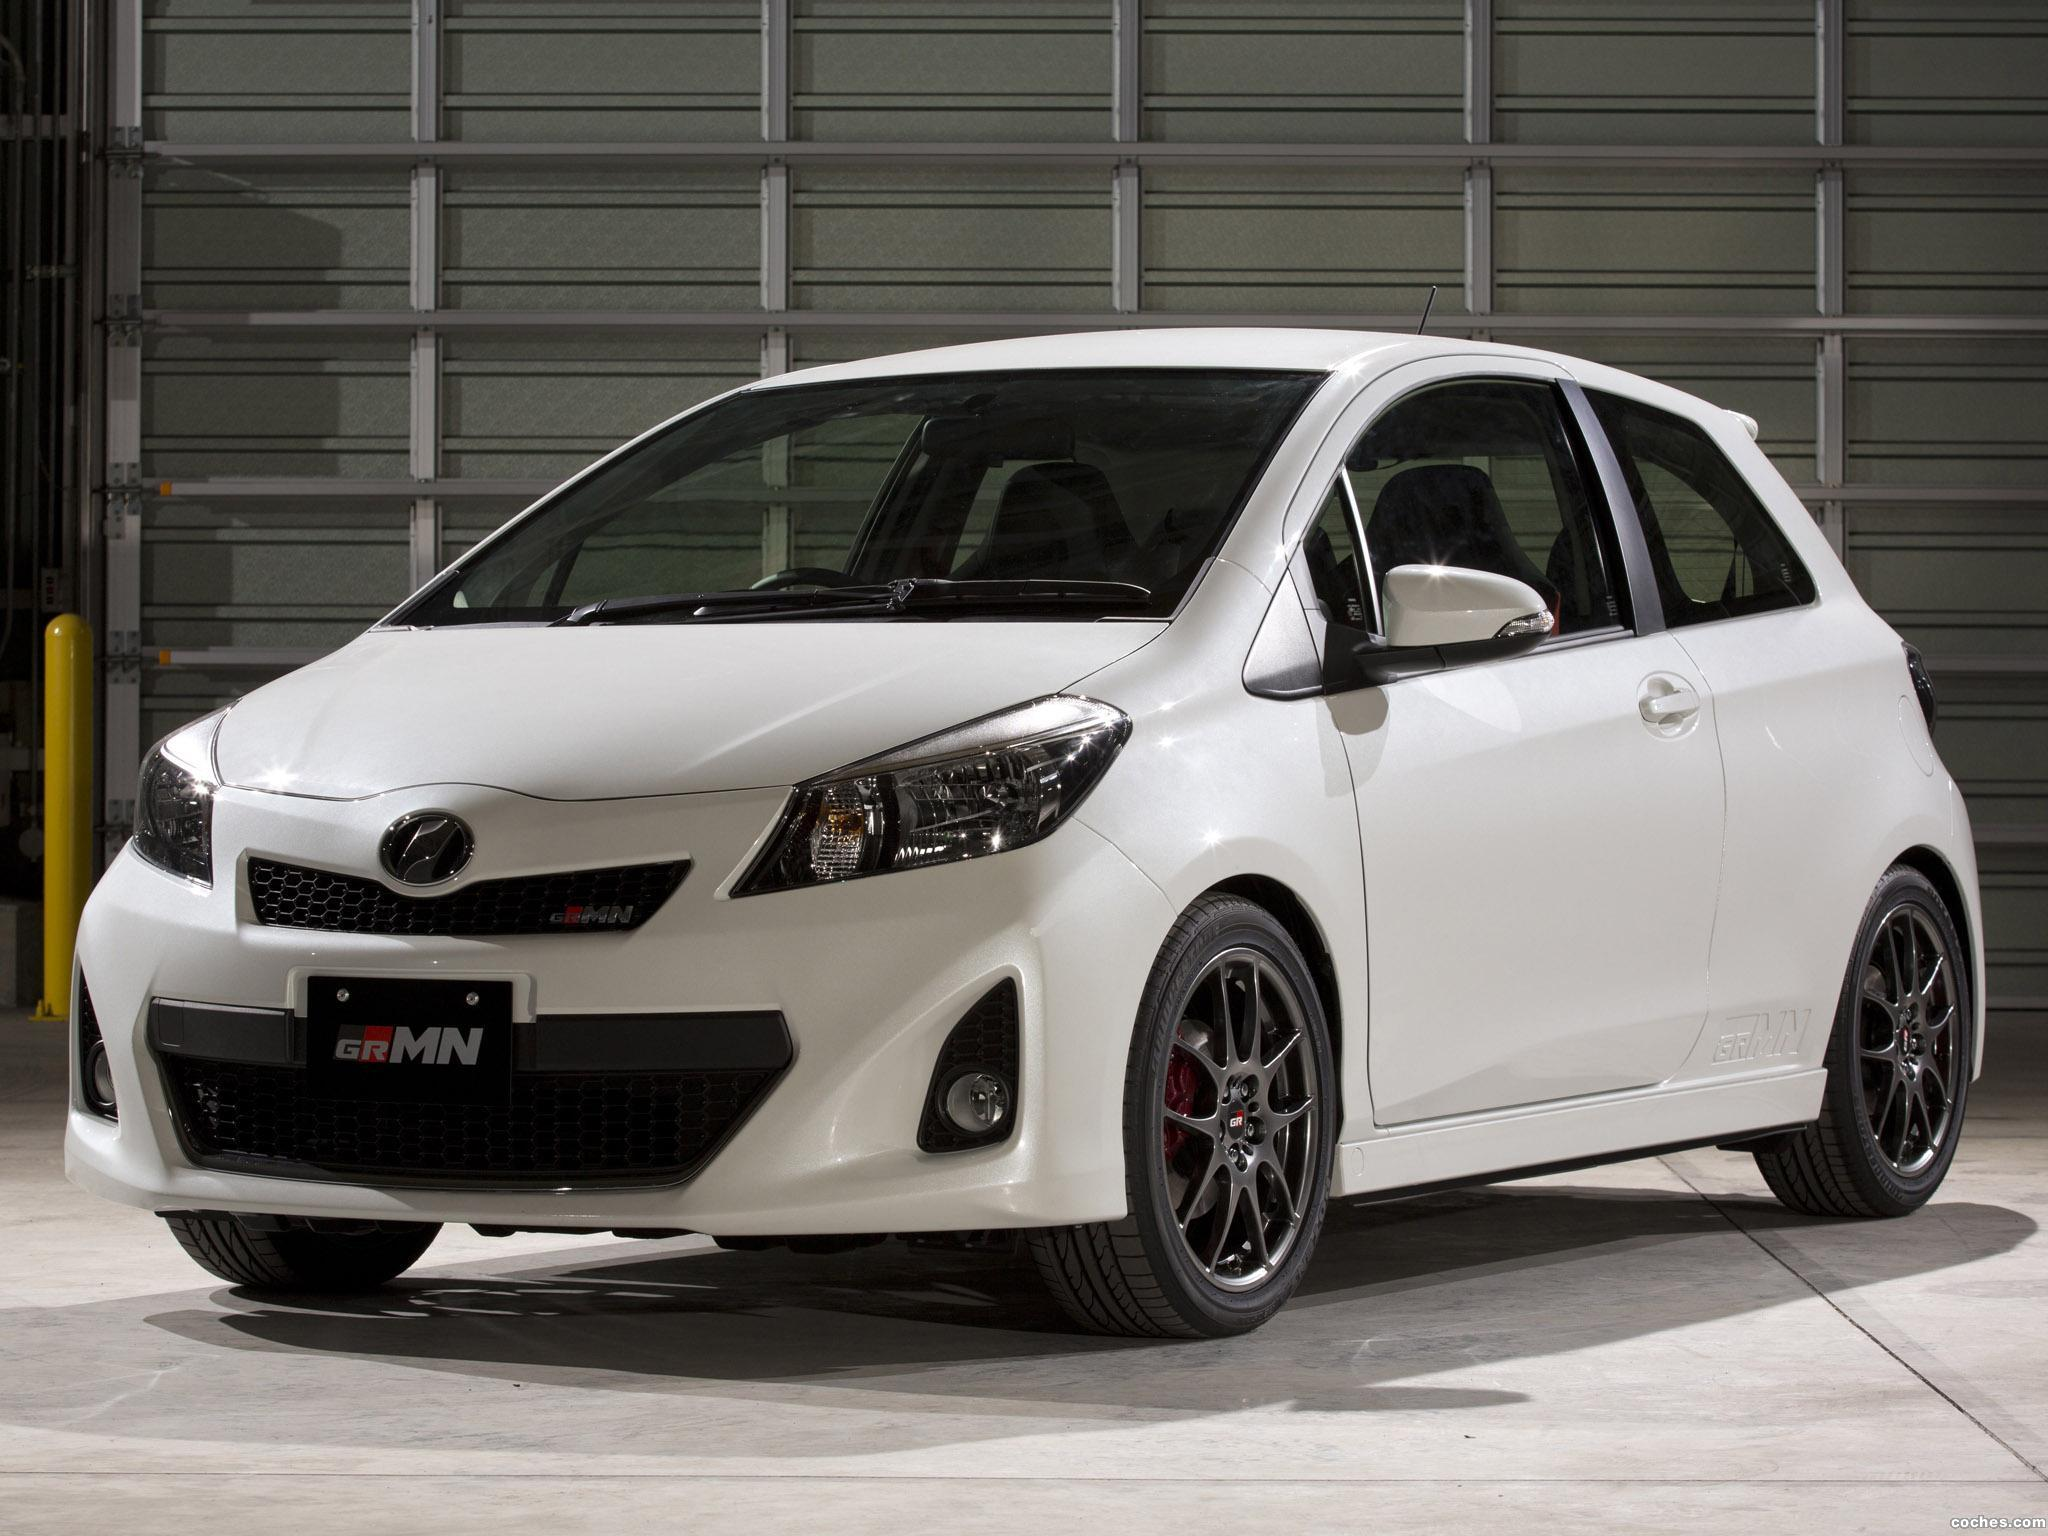 Foto 0 de GRMN Toyota Vitz Turbo Concept 2013